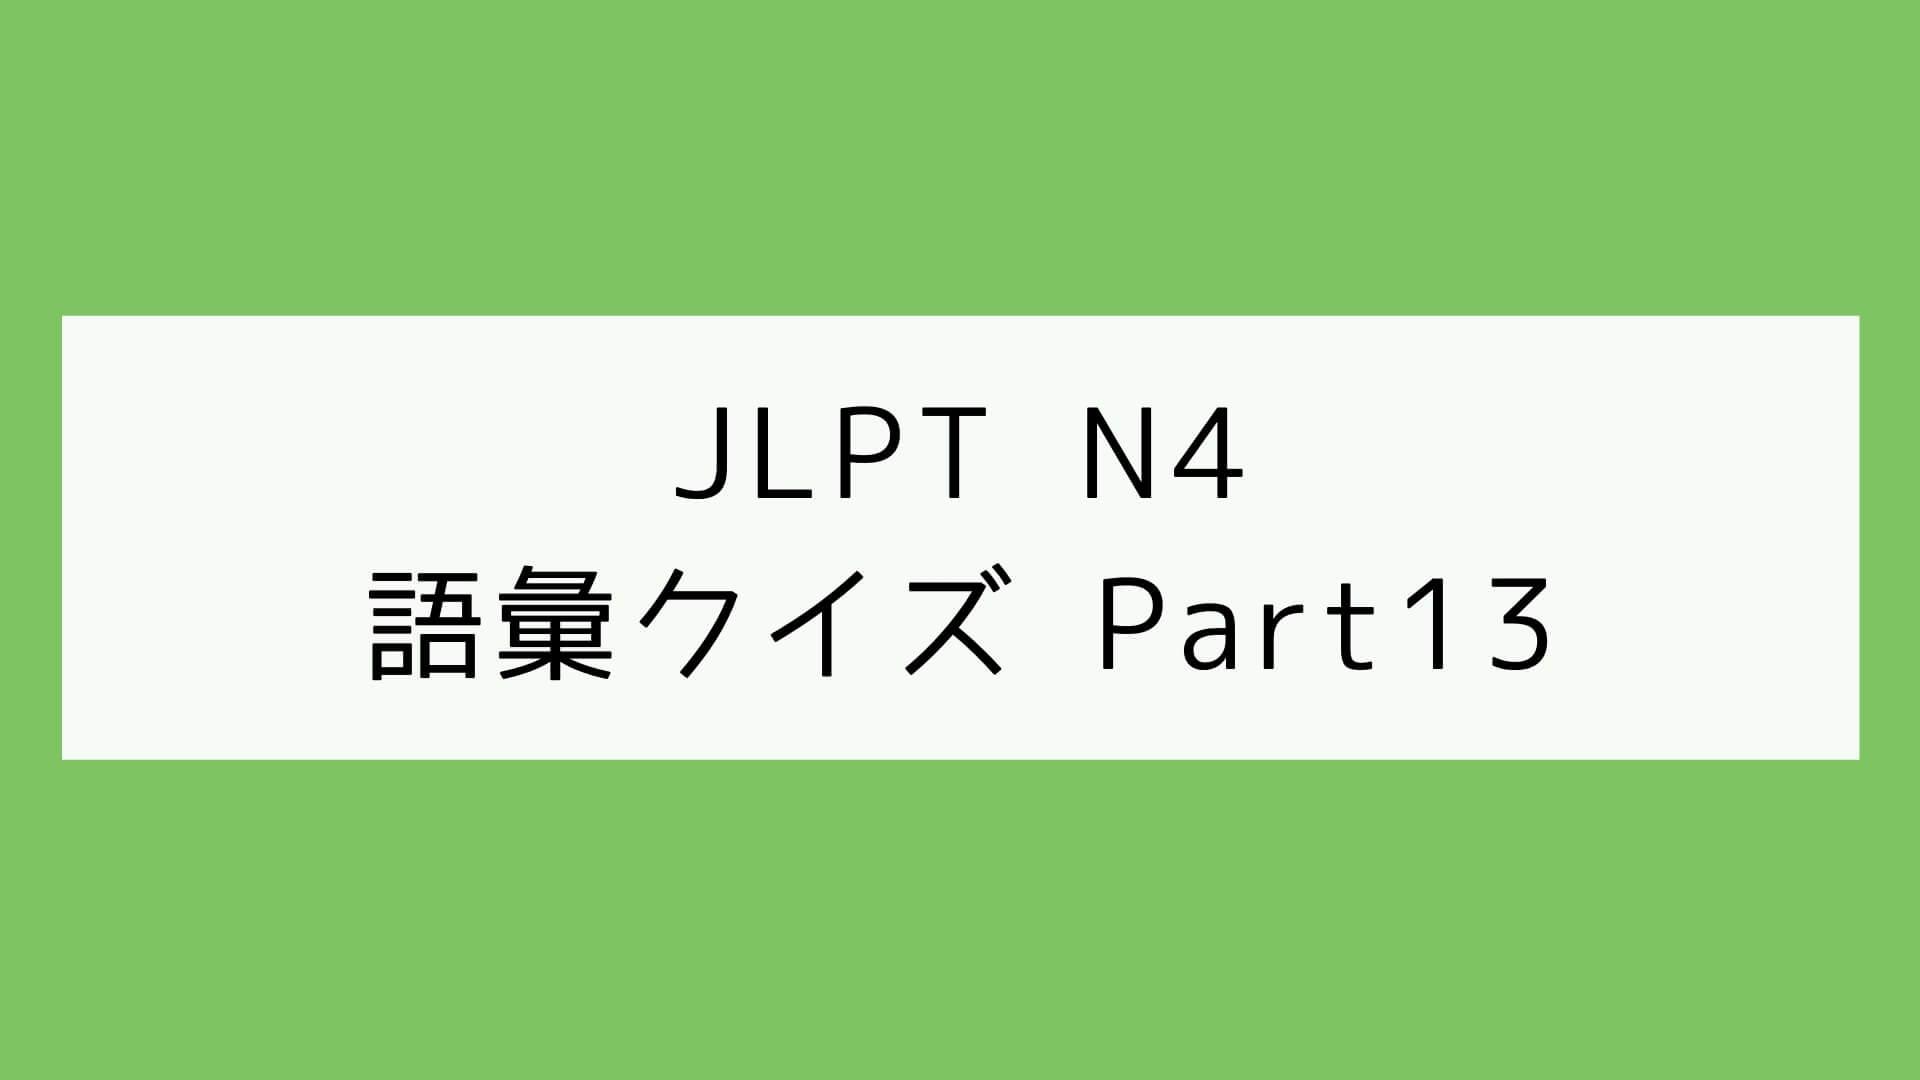 【JLPT N4】語彙クイズ Part13